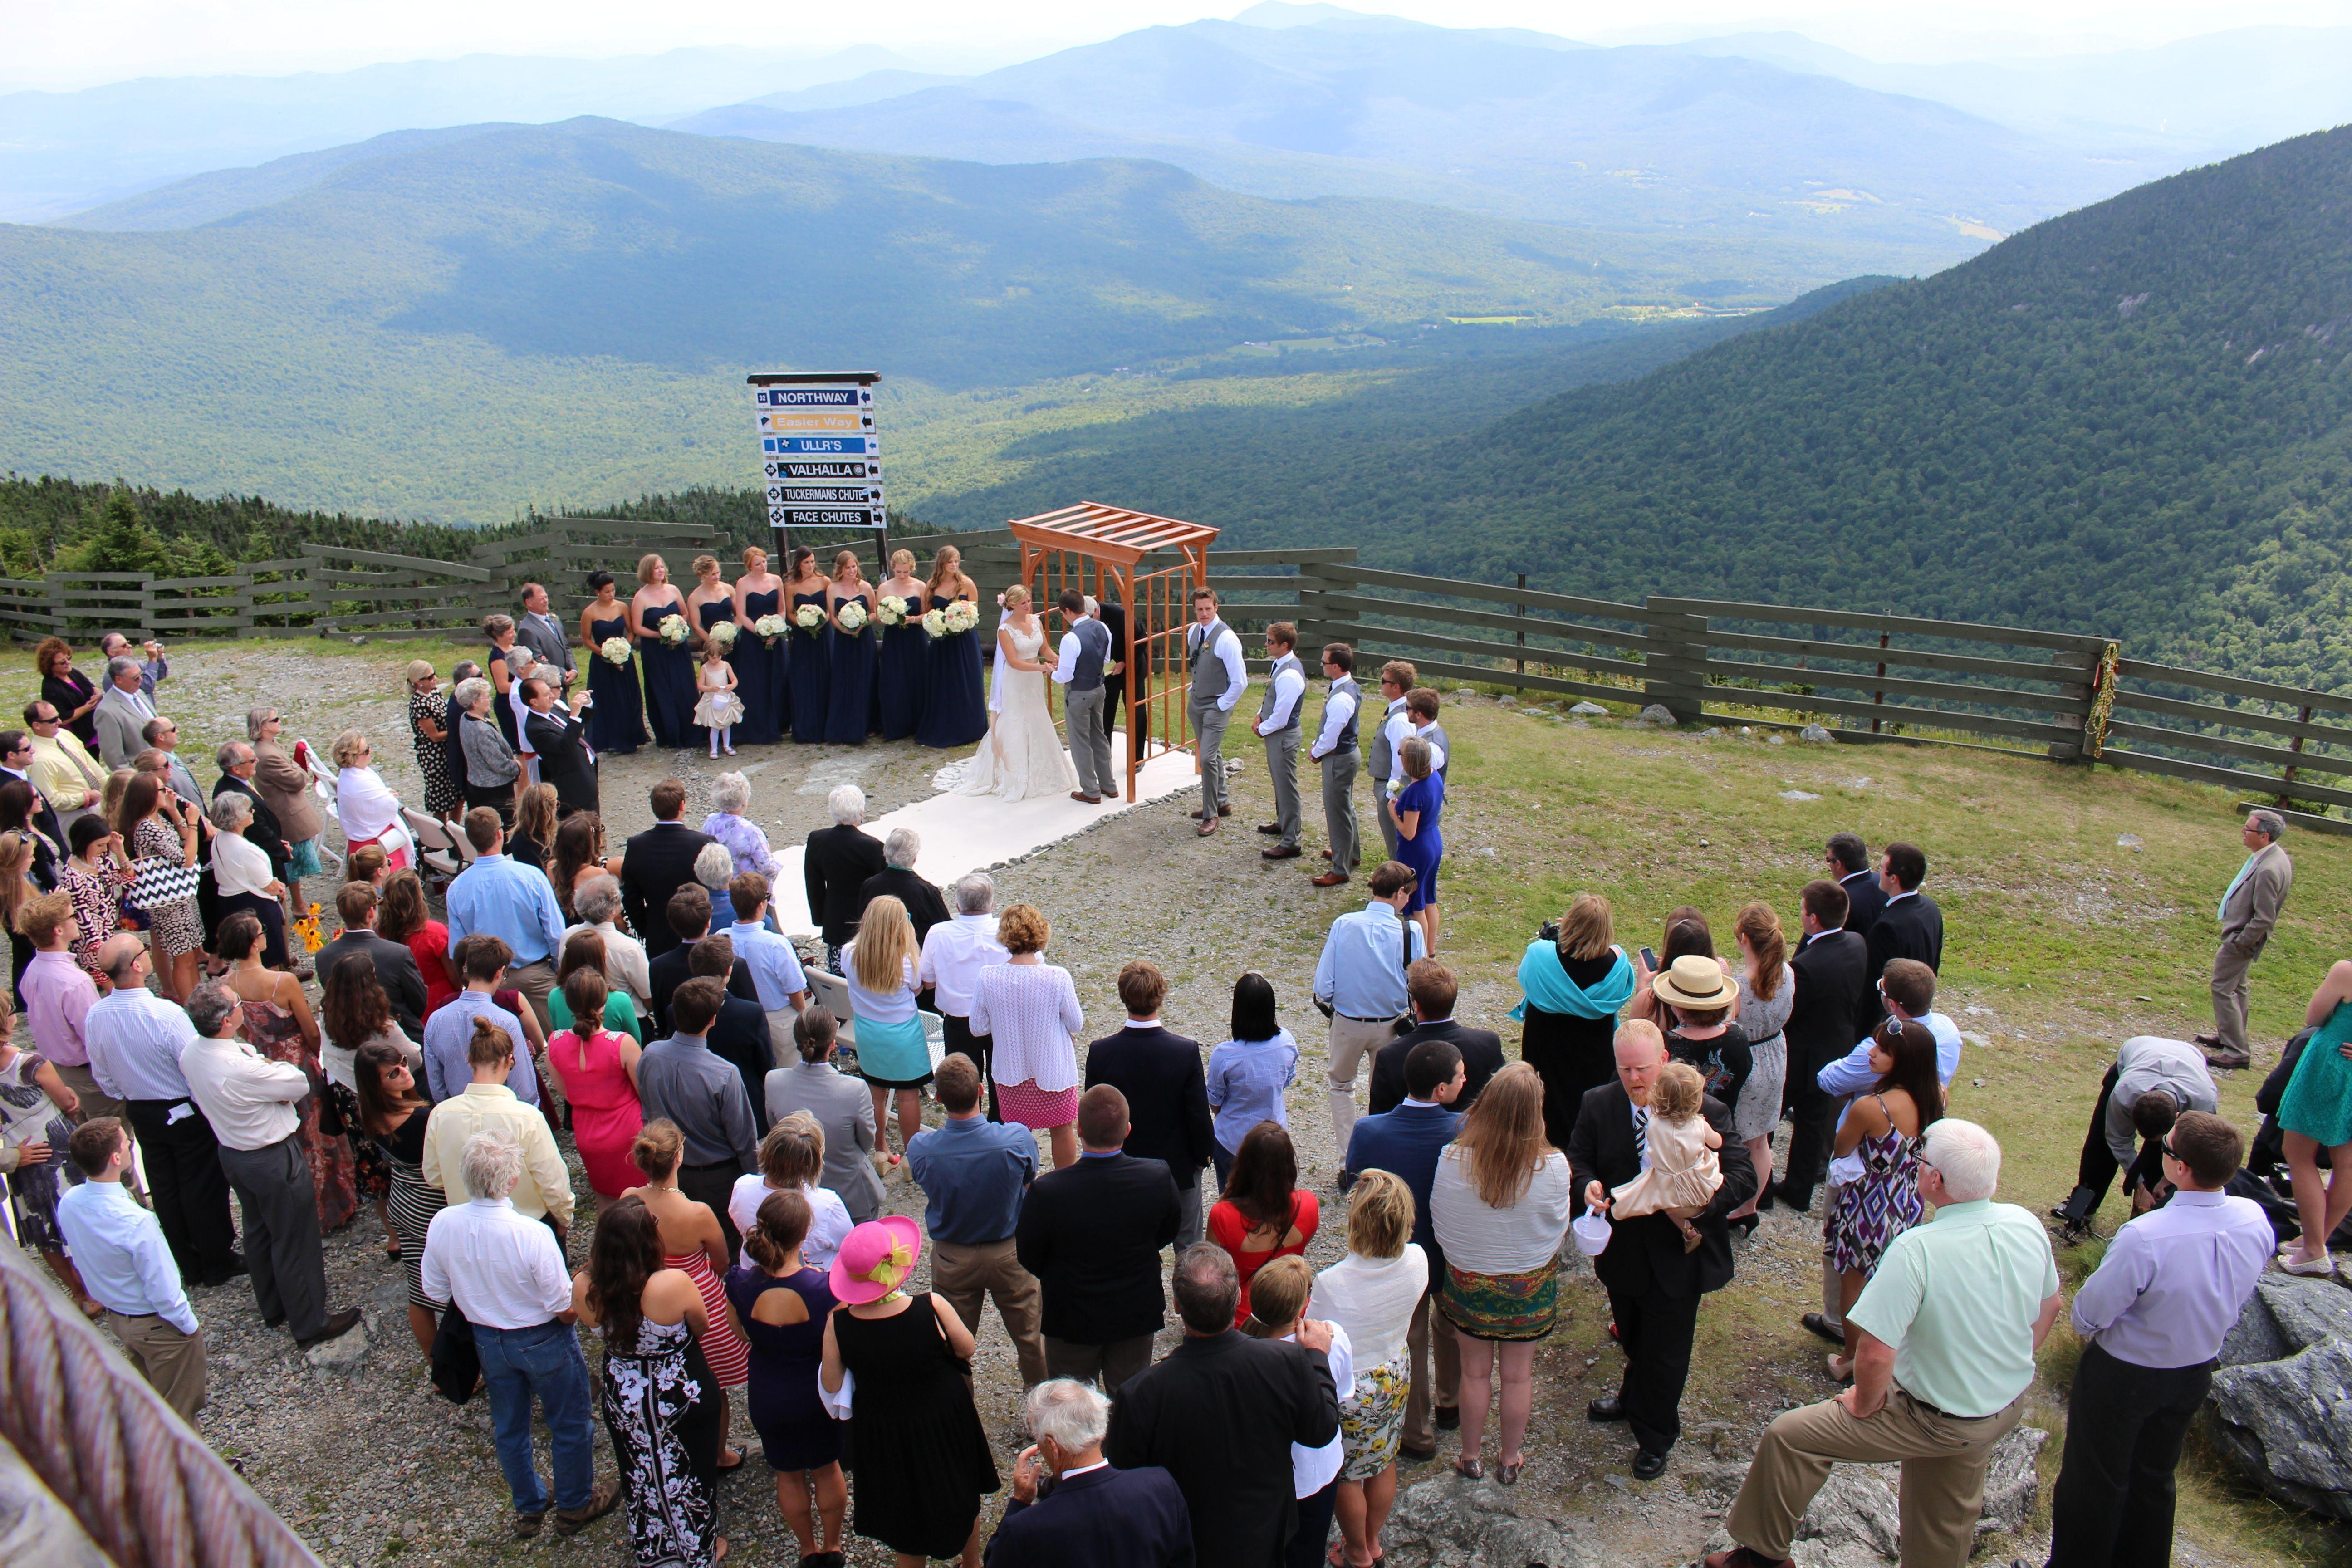 Jay Peak Resort Elevation 4000 Vermont Wedding Jay Peak Jay Peak Resort Vermont Wedding